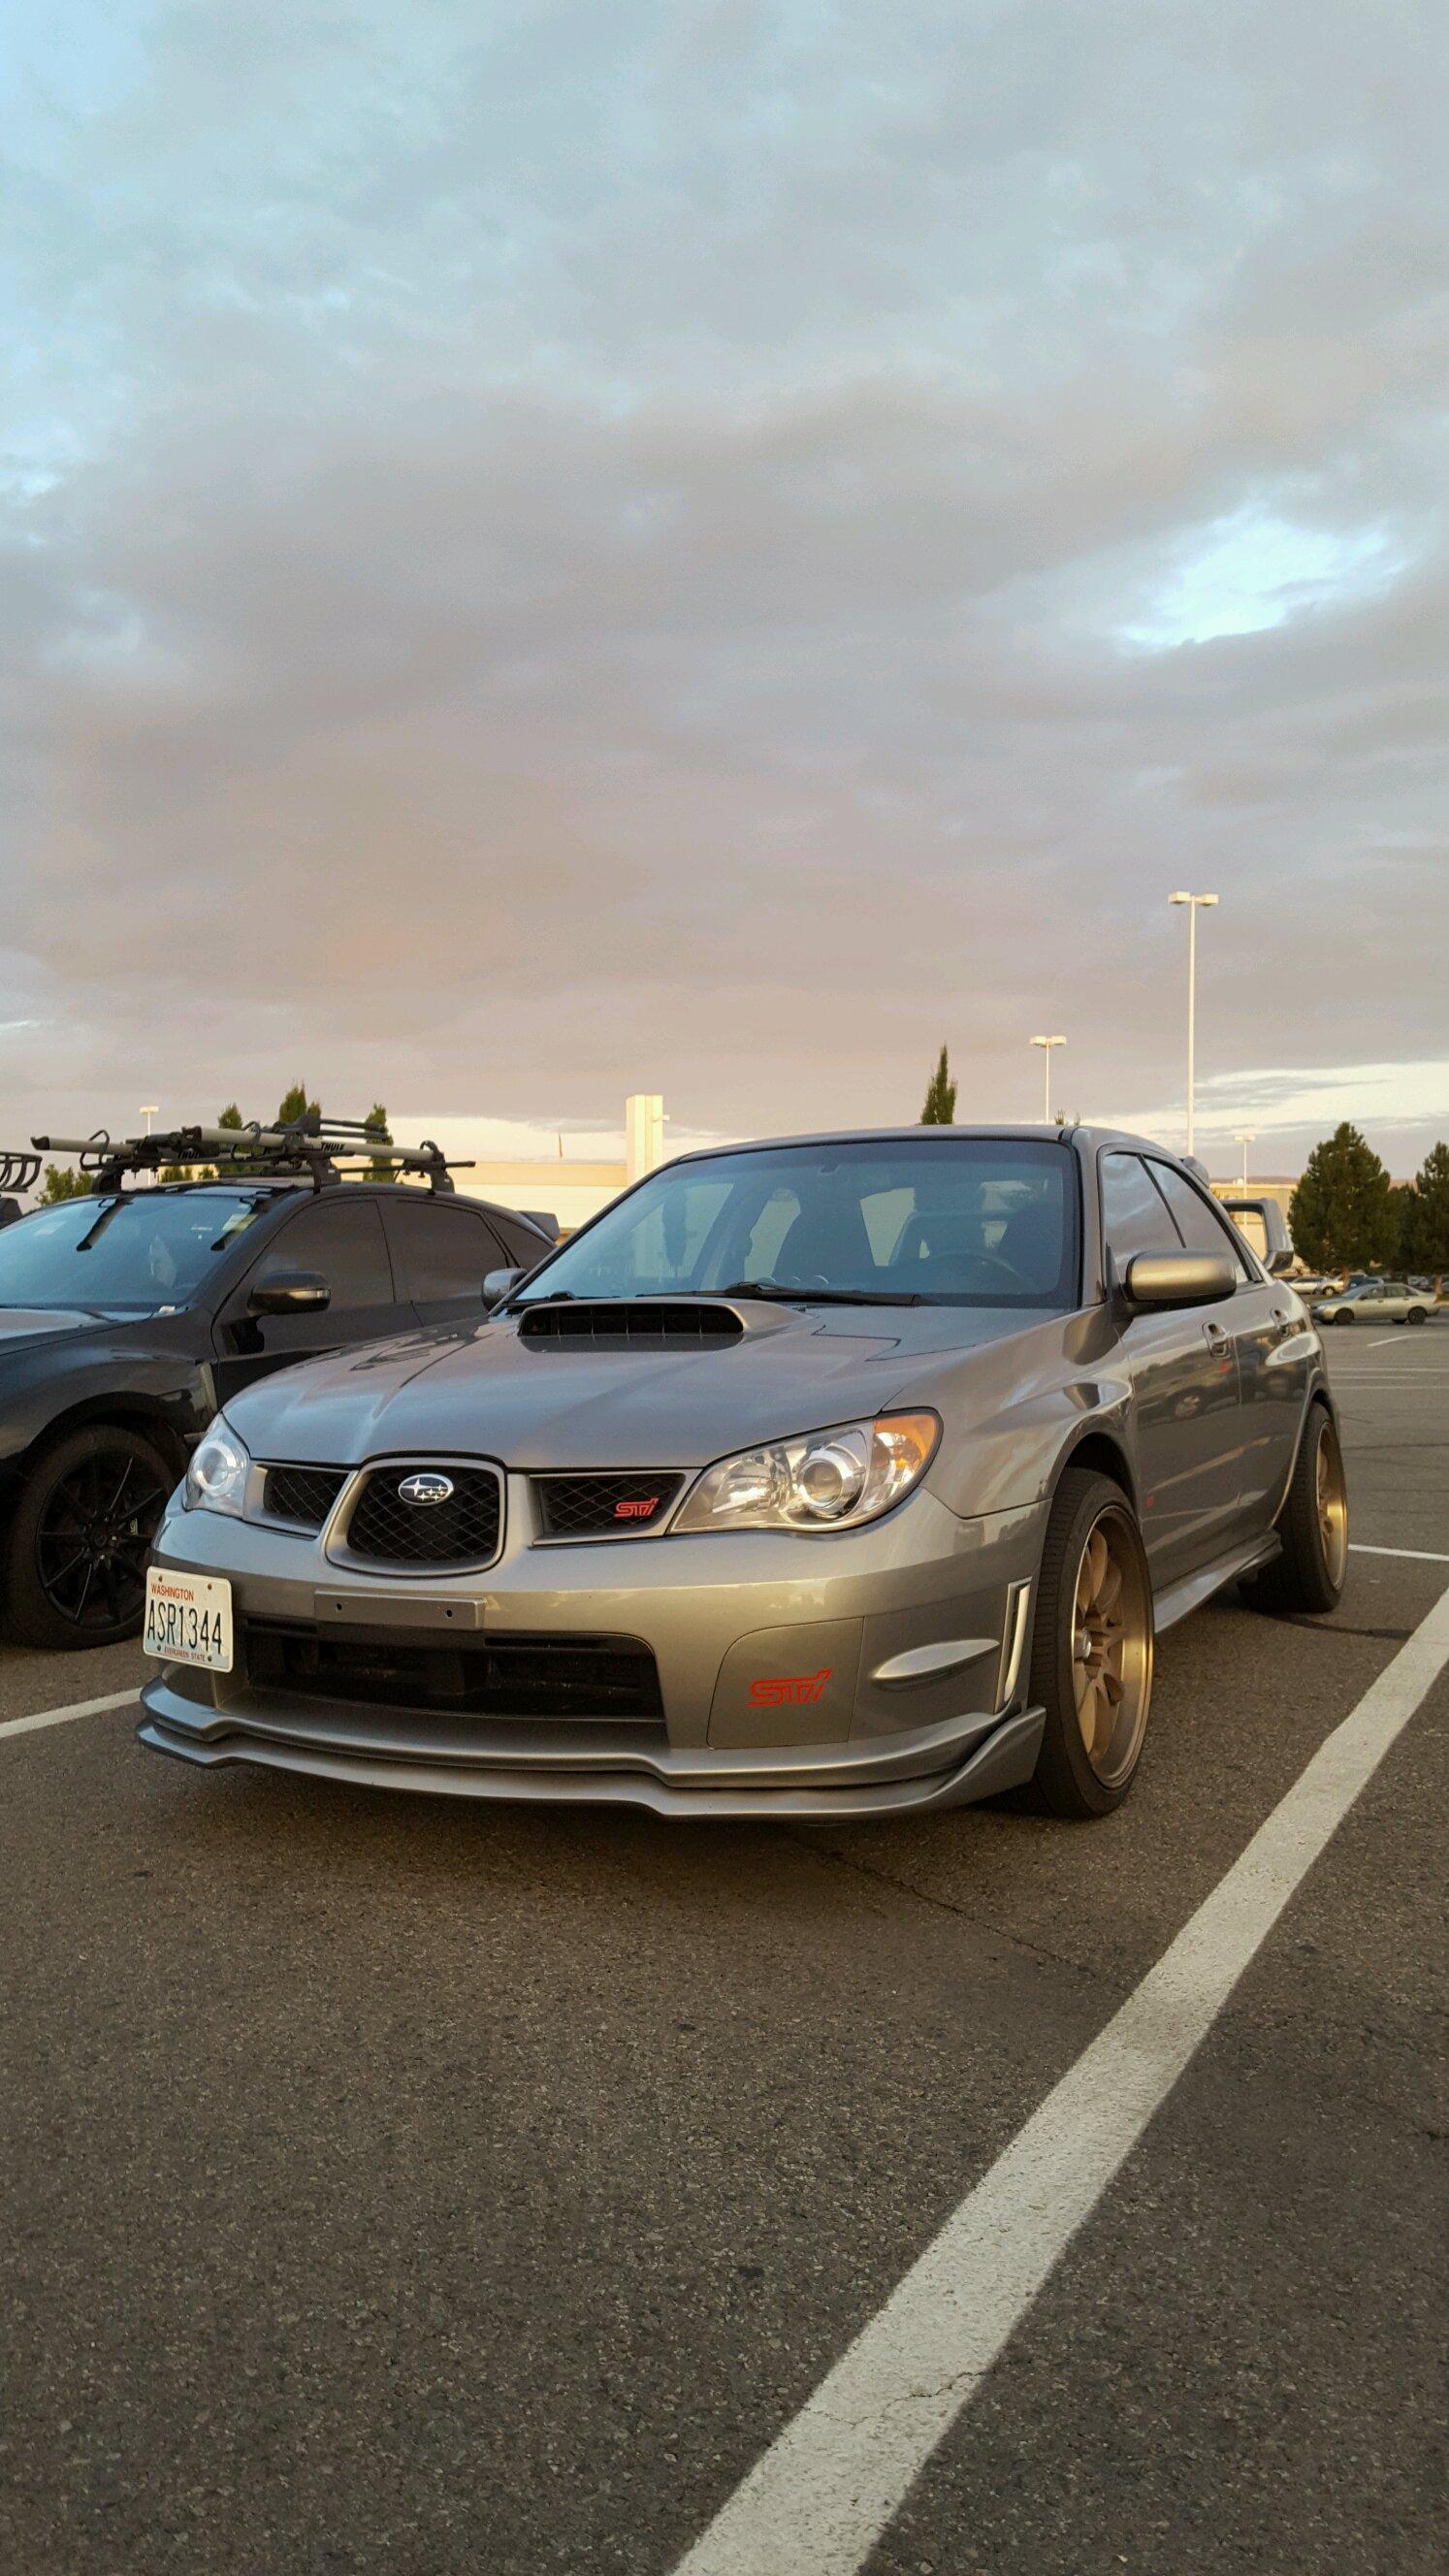 What Do You Think Of My Photography Skills Also Really Cool Subaru Hawkeye Wrx Sti